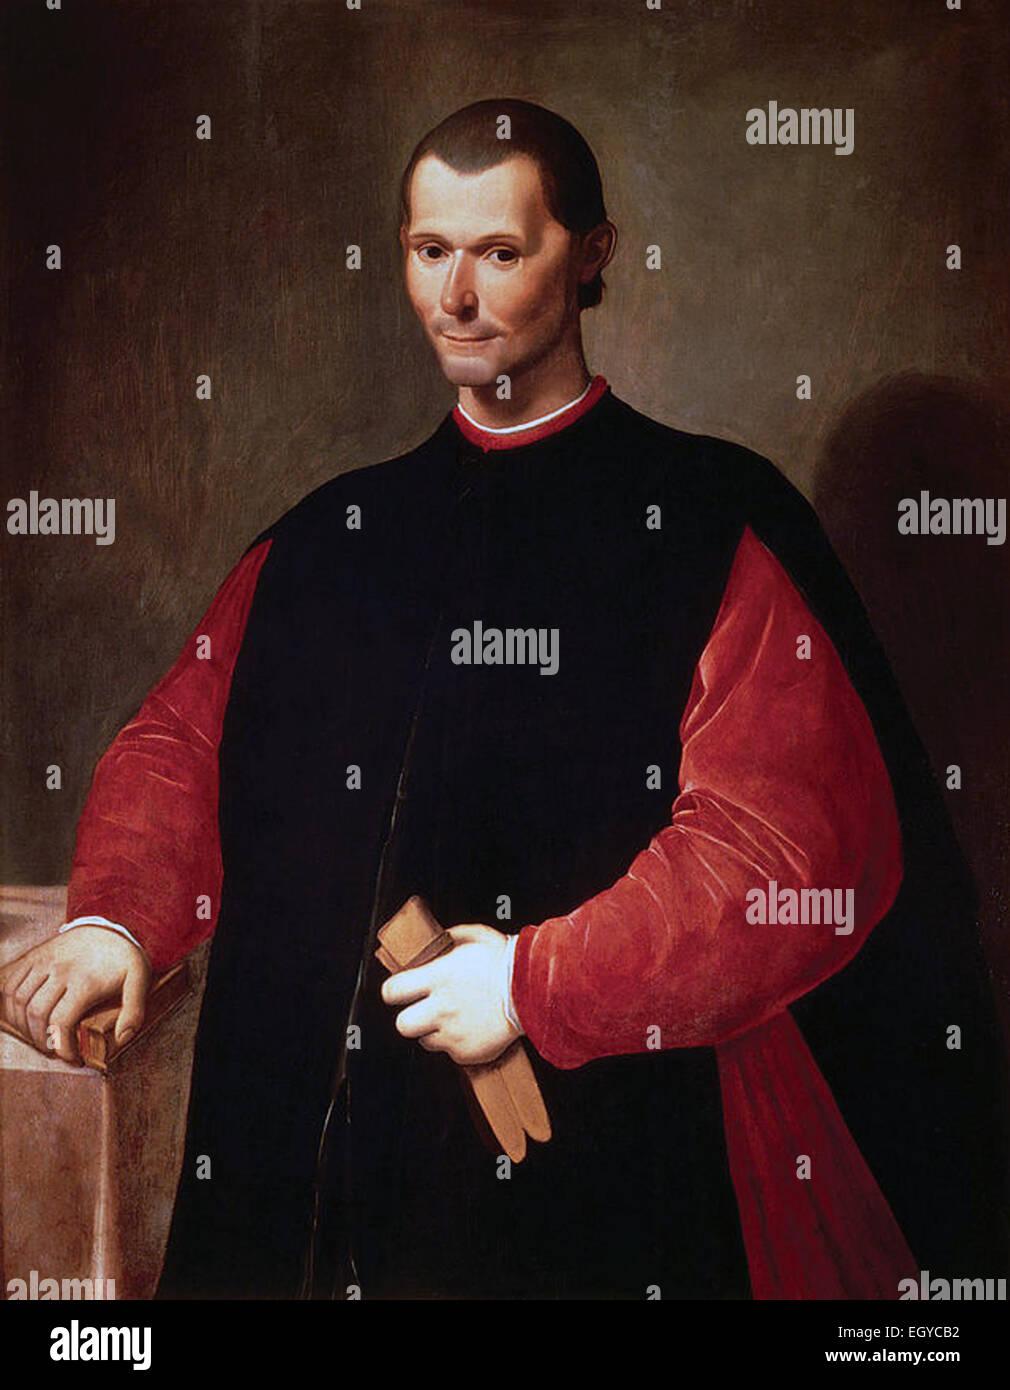 Retrato de Niccolo Machiavelli por Santi di Tito. Niccolò di Bernardo dei Machiavelli -3 Mayo de 1469 - 21 Imagen De Stock